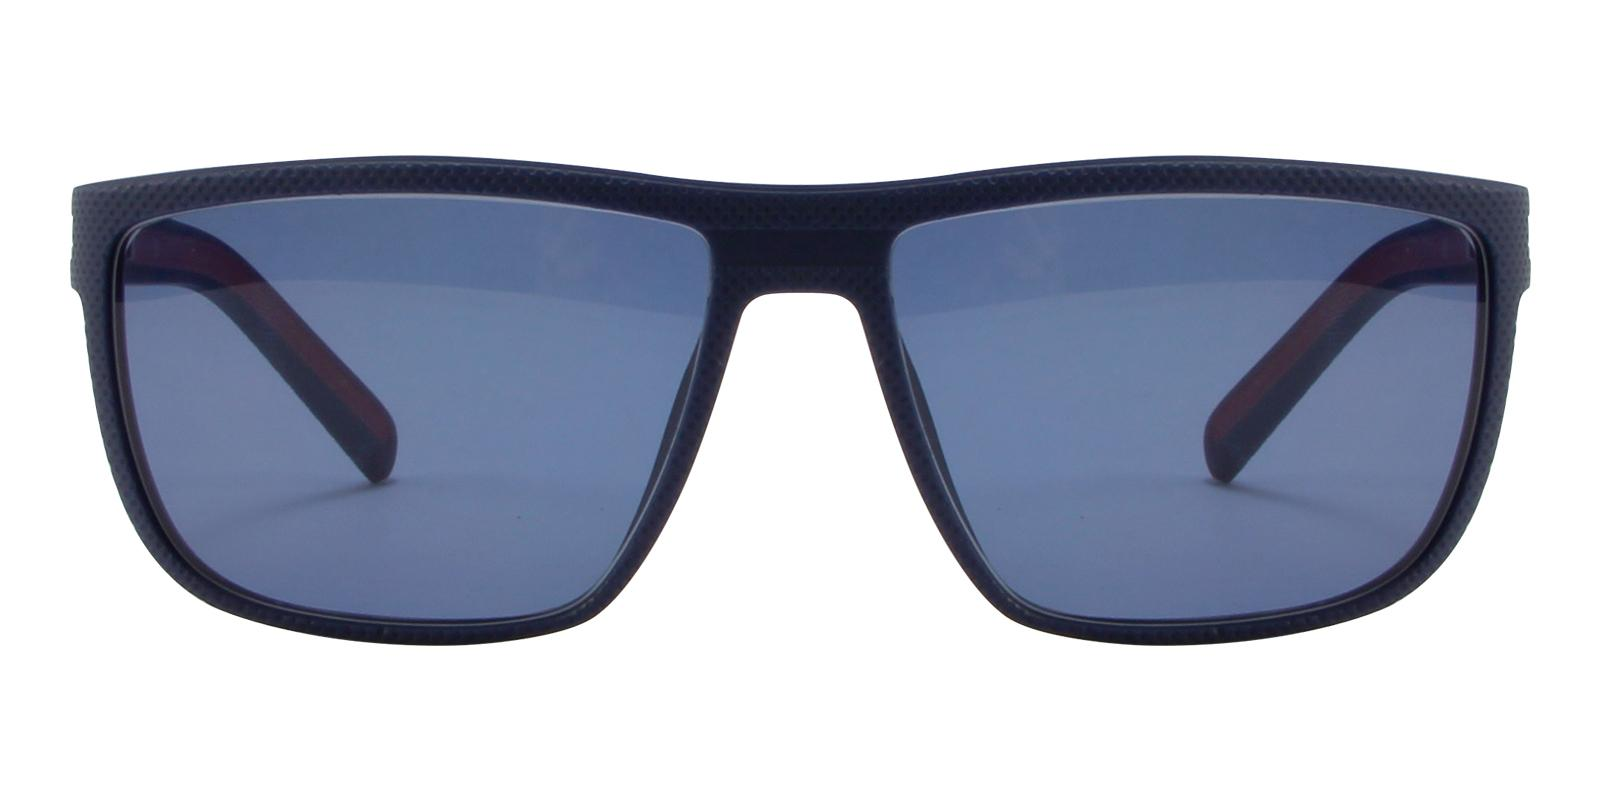 Tropic Blue TR SpringHinges , Sunglasses , UniversalBridgeFit Frames from ABBE Glasses